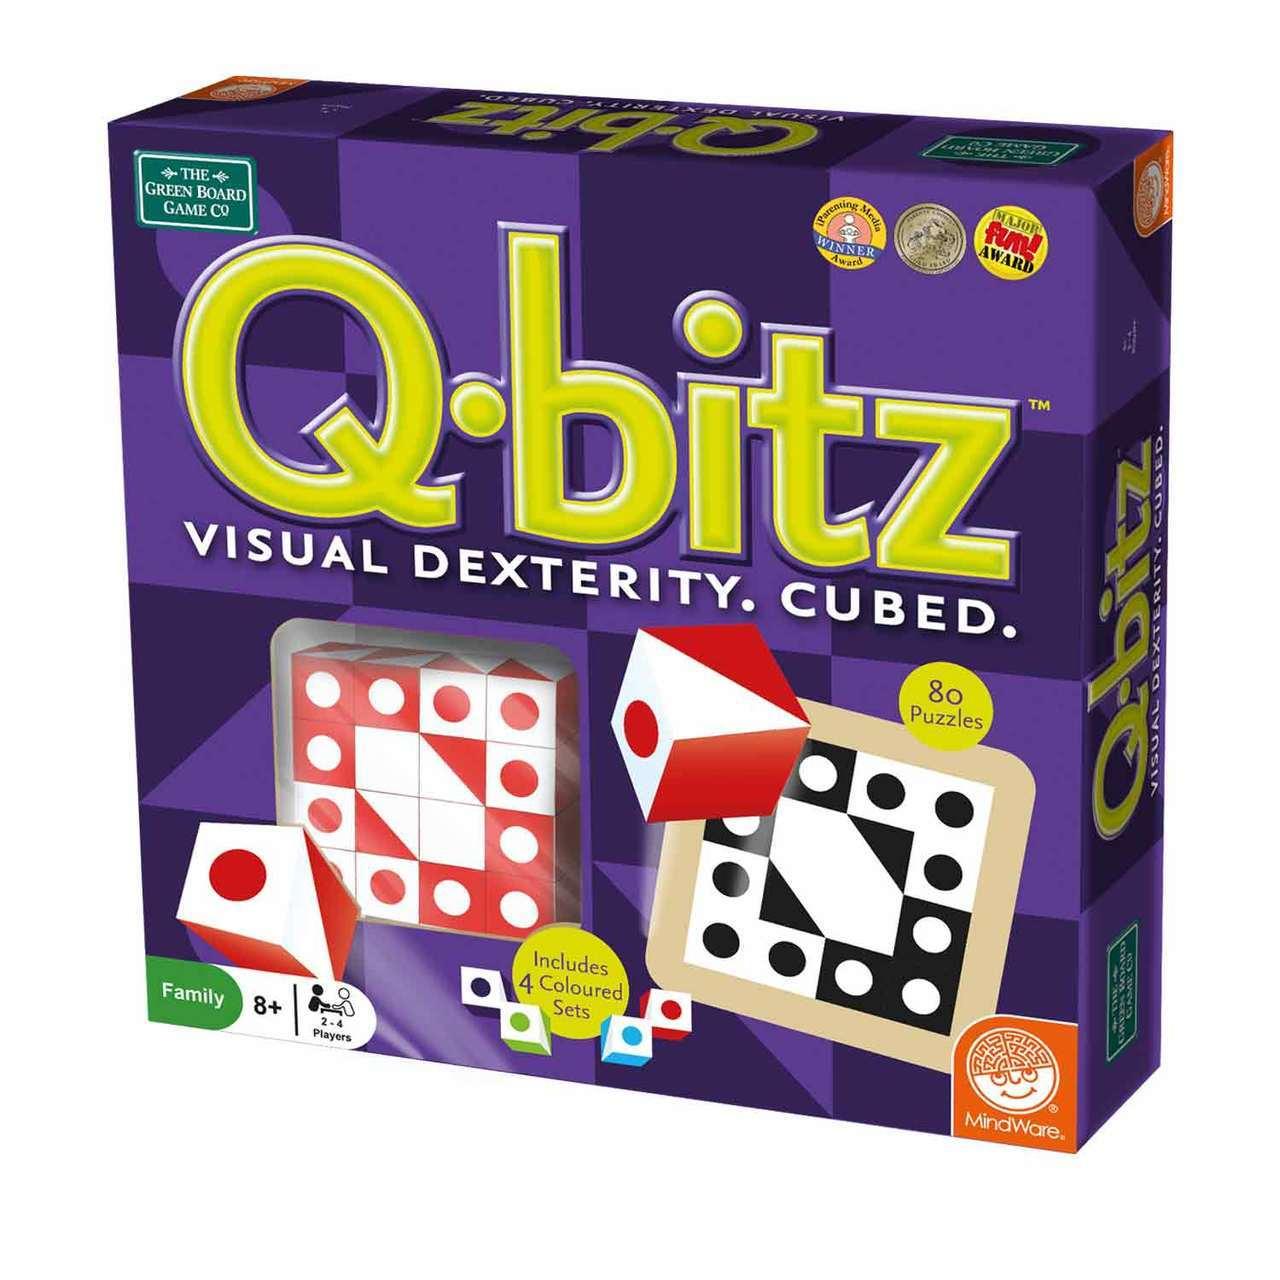 Creative Q-bitz